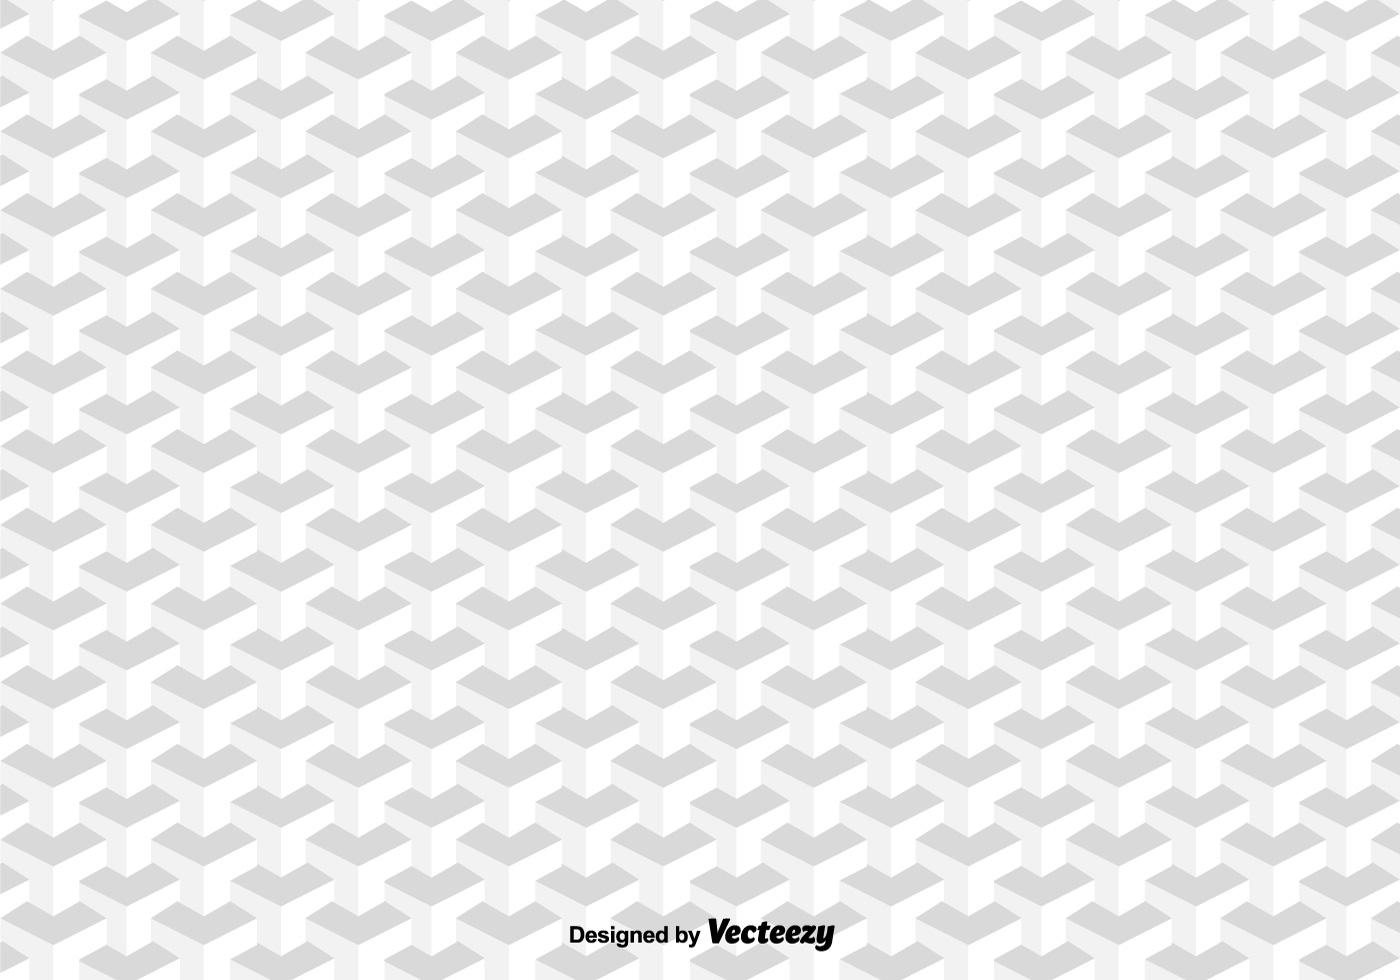 3d Cubes Vector Pattern